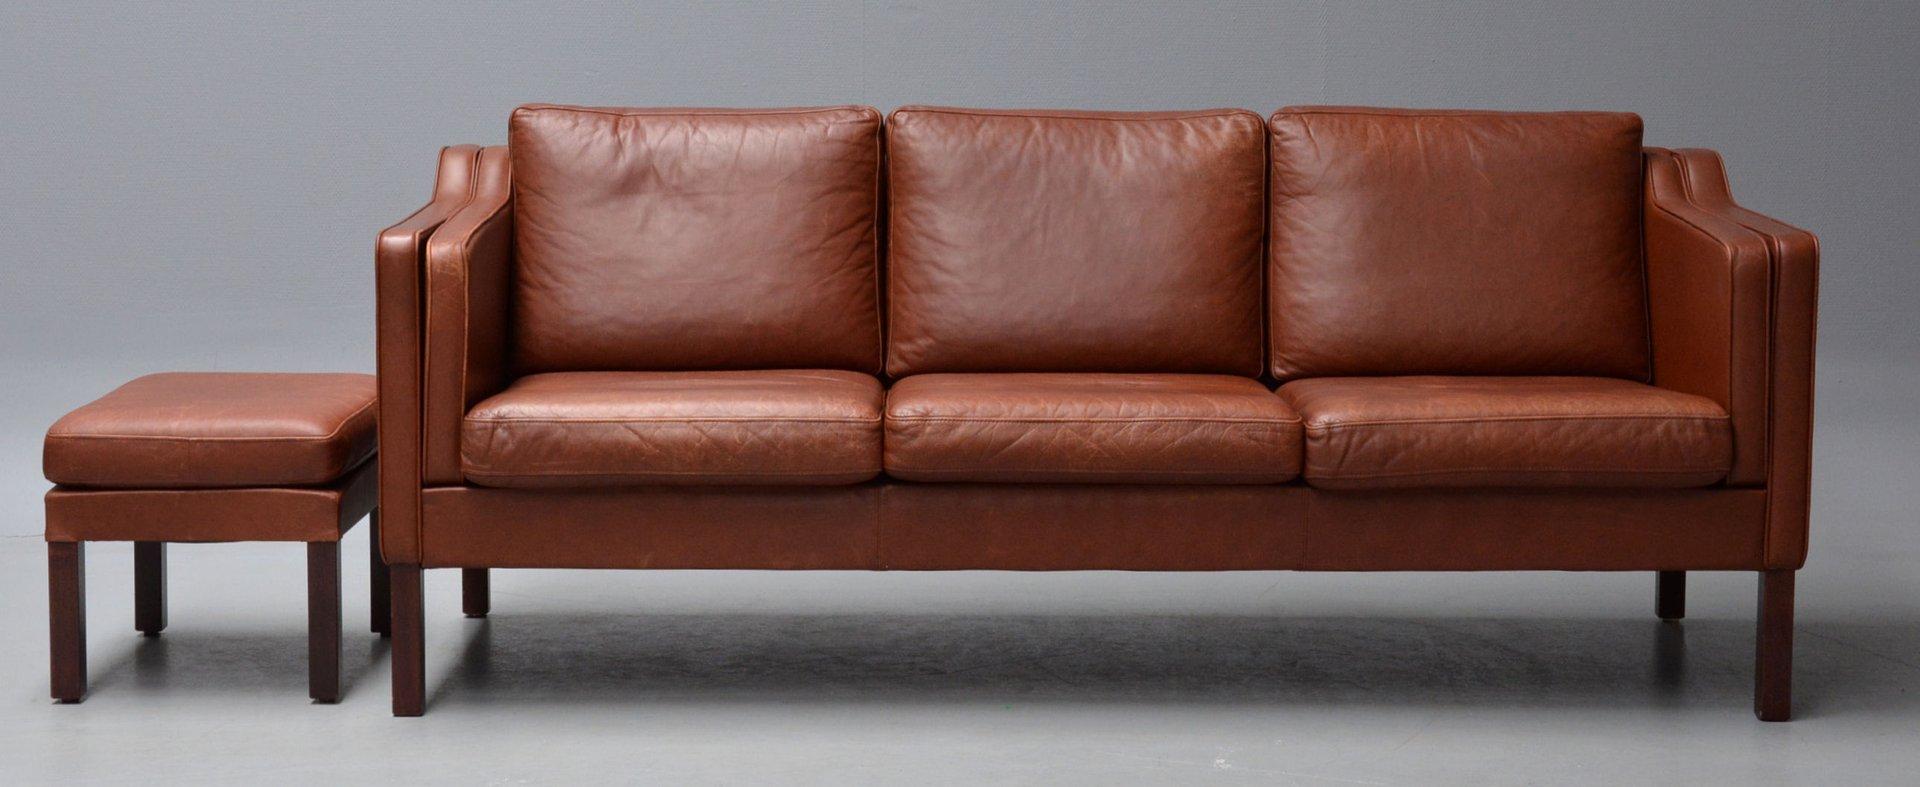 braunes ledersofa mit hocker 1960er bei pamono kaufen. Black Bedroom Furniture Sets. Home Design Ideas